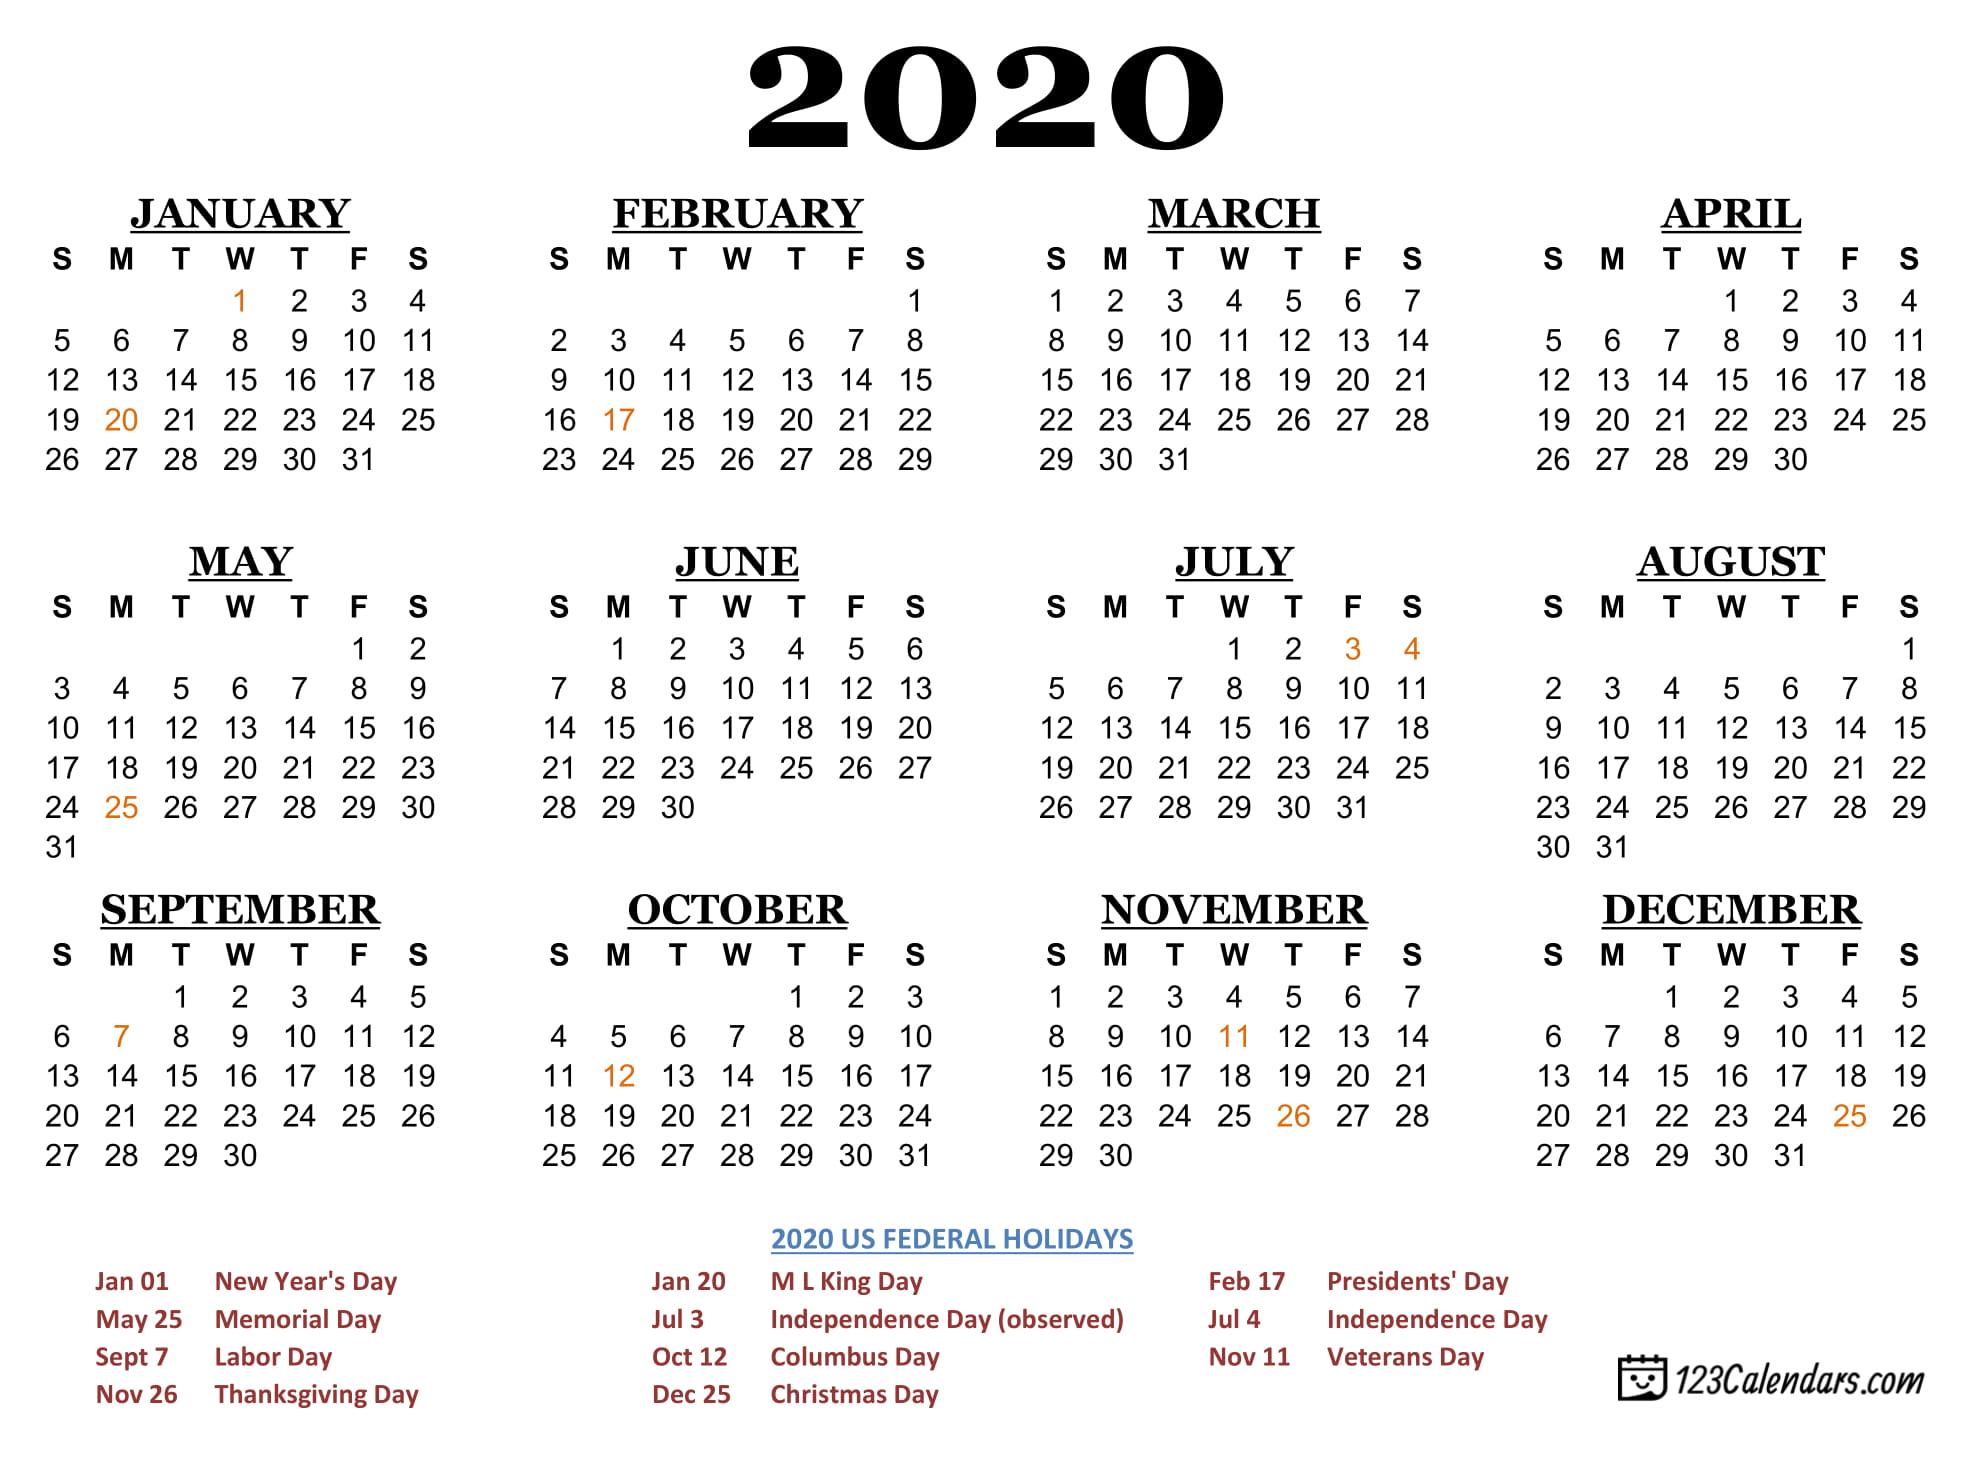 Free Printable 2020 Calendar | 123Calendars pertaining to Printable 2020 Wallet Calendar